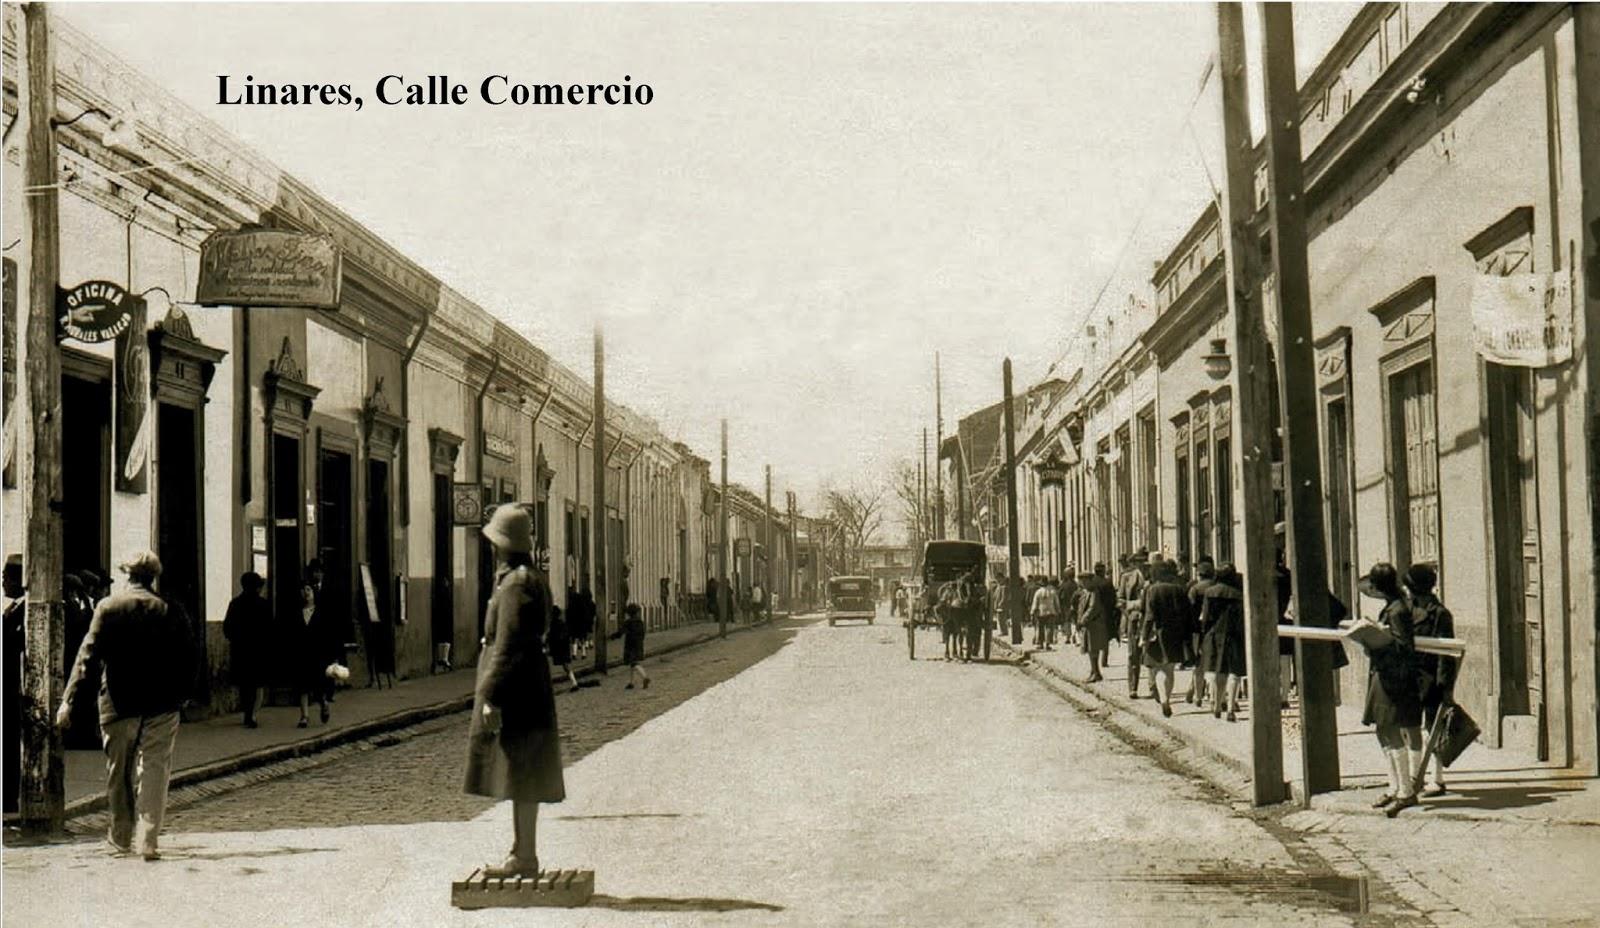 Enterreno - Fotos históricas de chile - fotos antiguas de Chile - Calle comercio de Linare sen 1930